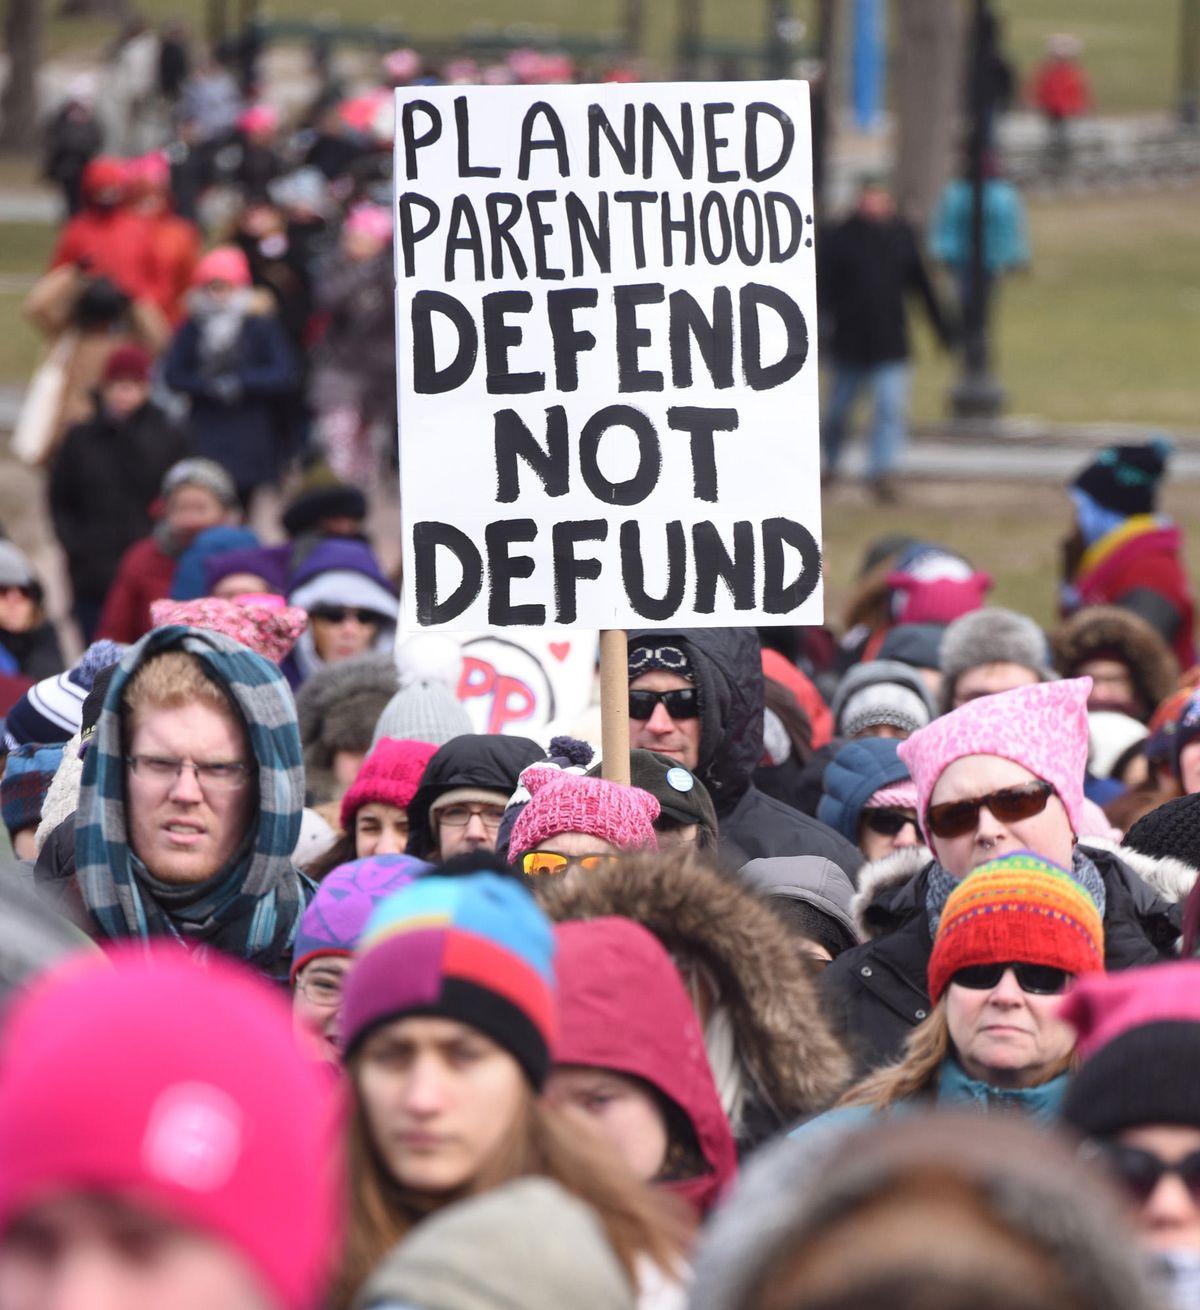 The War Against Planned Parenthood Is A War On Women